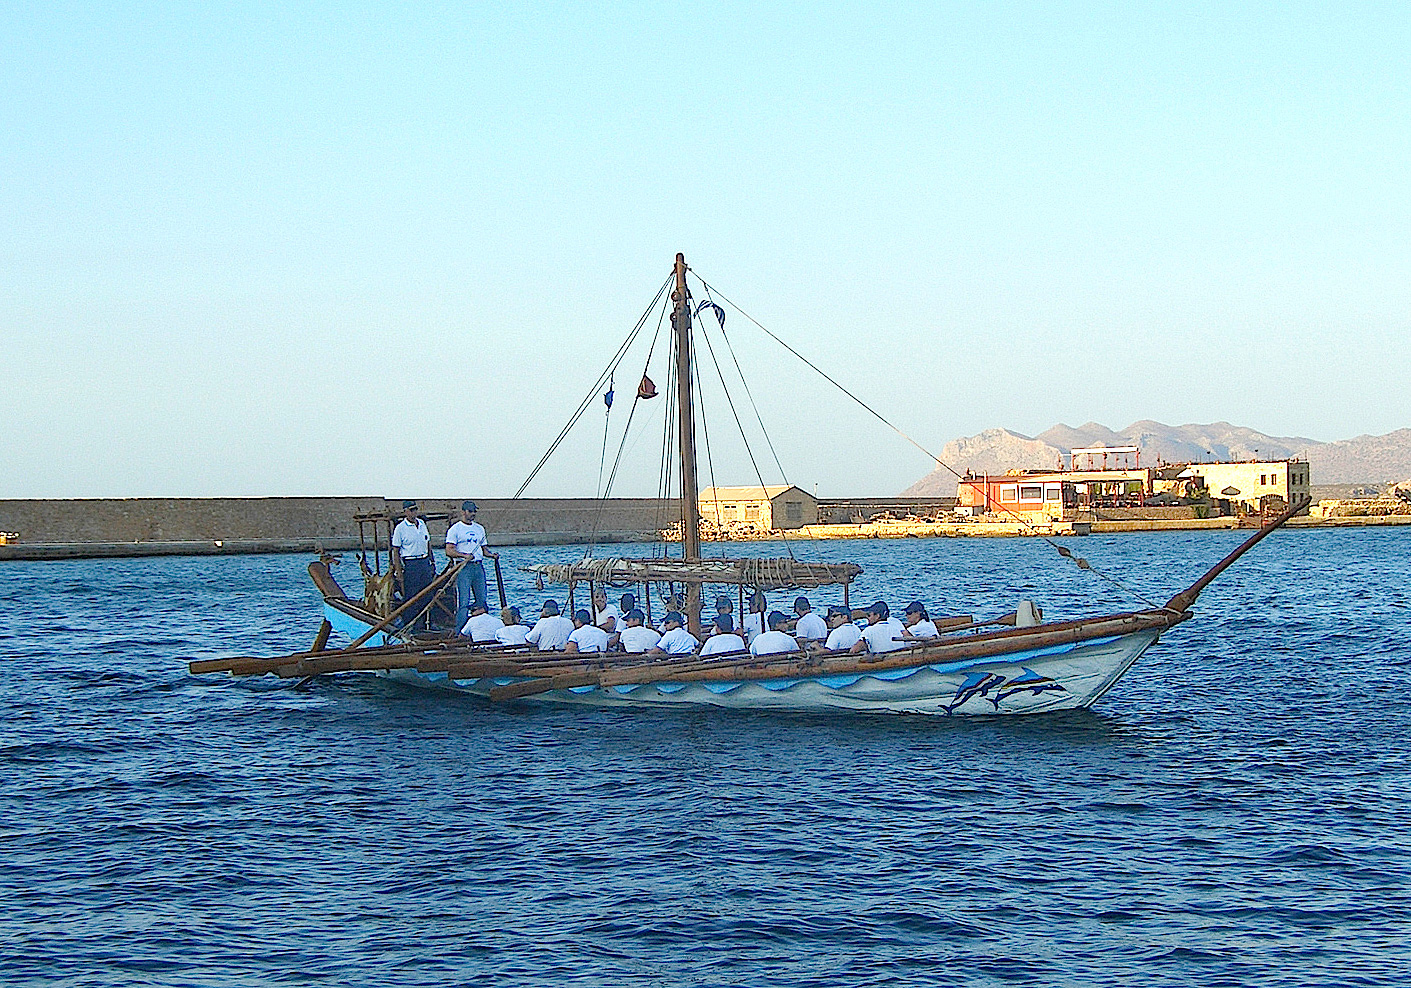 The Minoan Ship sailing